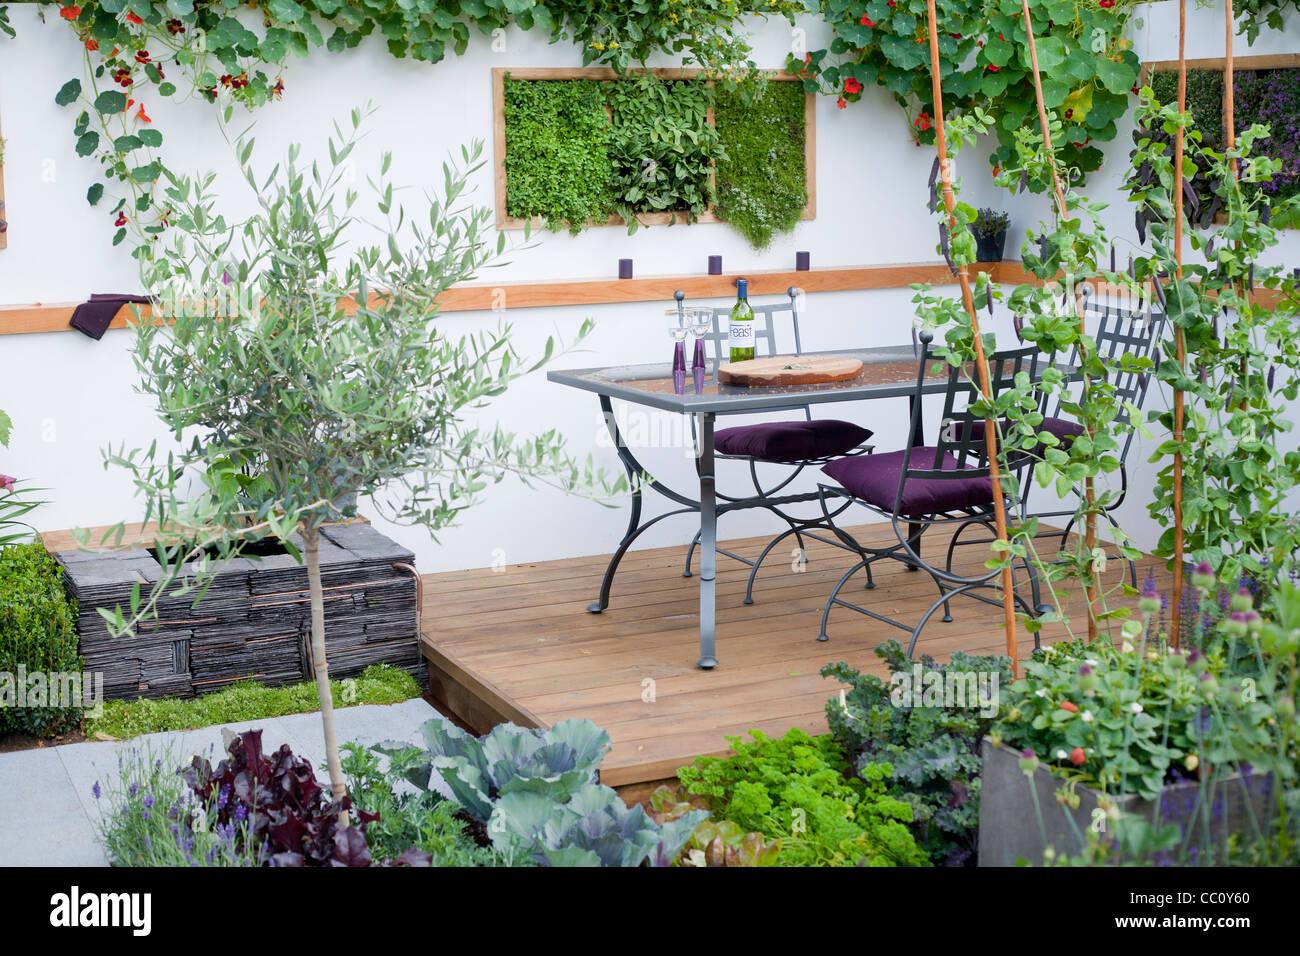 Mobili Cucina Giardino | Leroy Merlin Mobili Cucina